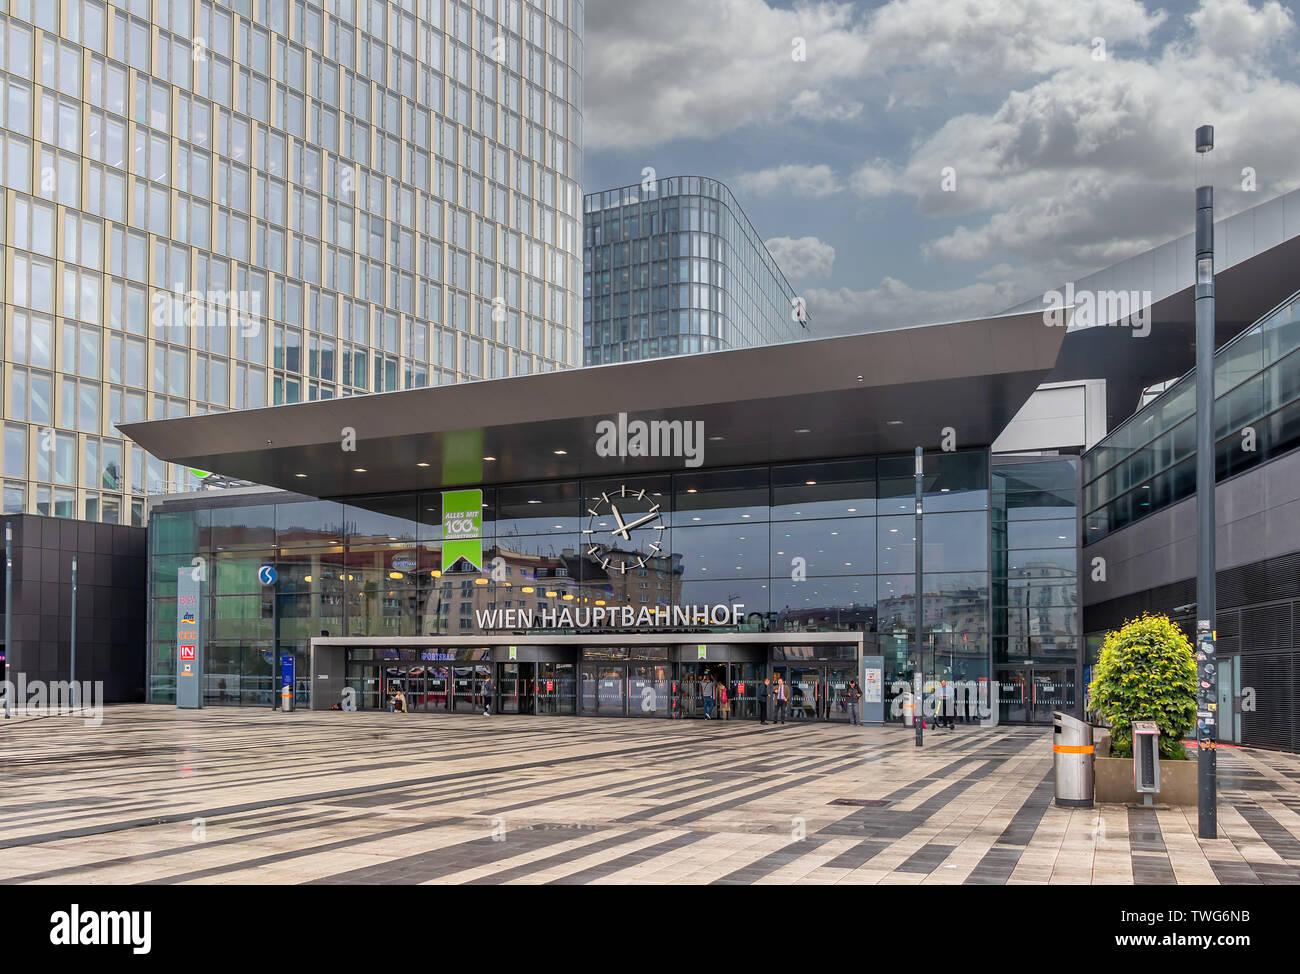 Main railway station of Vienna (Wien Hauptbahnhof) Austrian railways (OBB) in Vienna, Austria - Stock Image